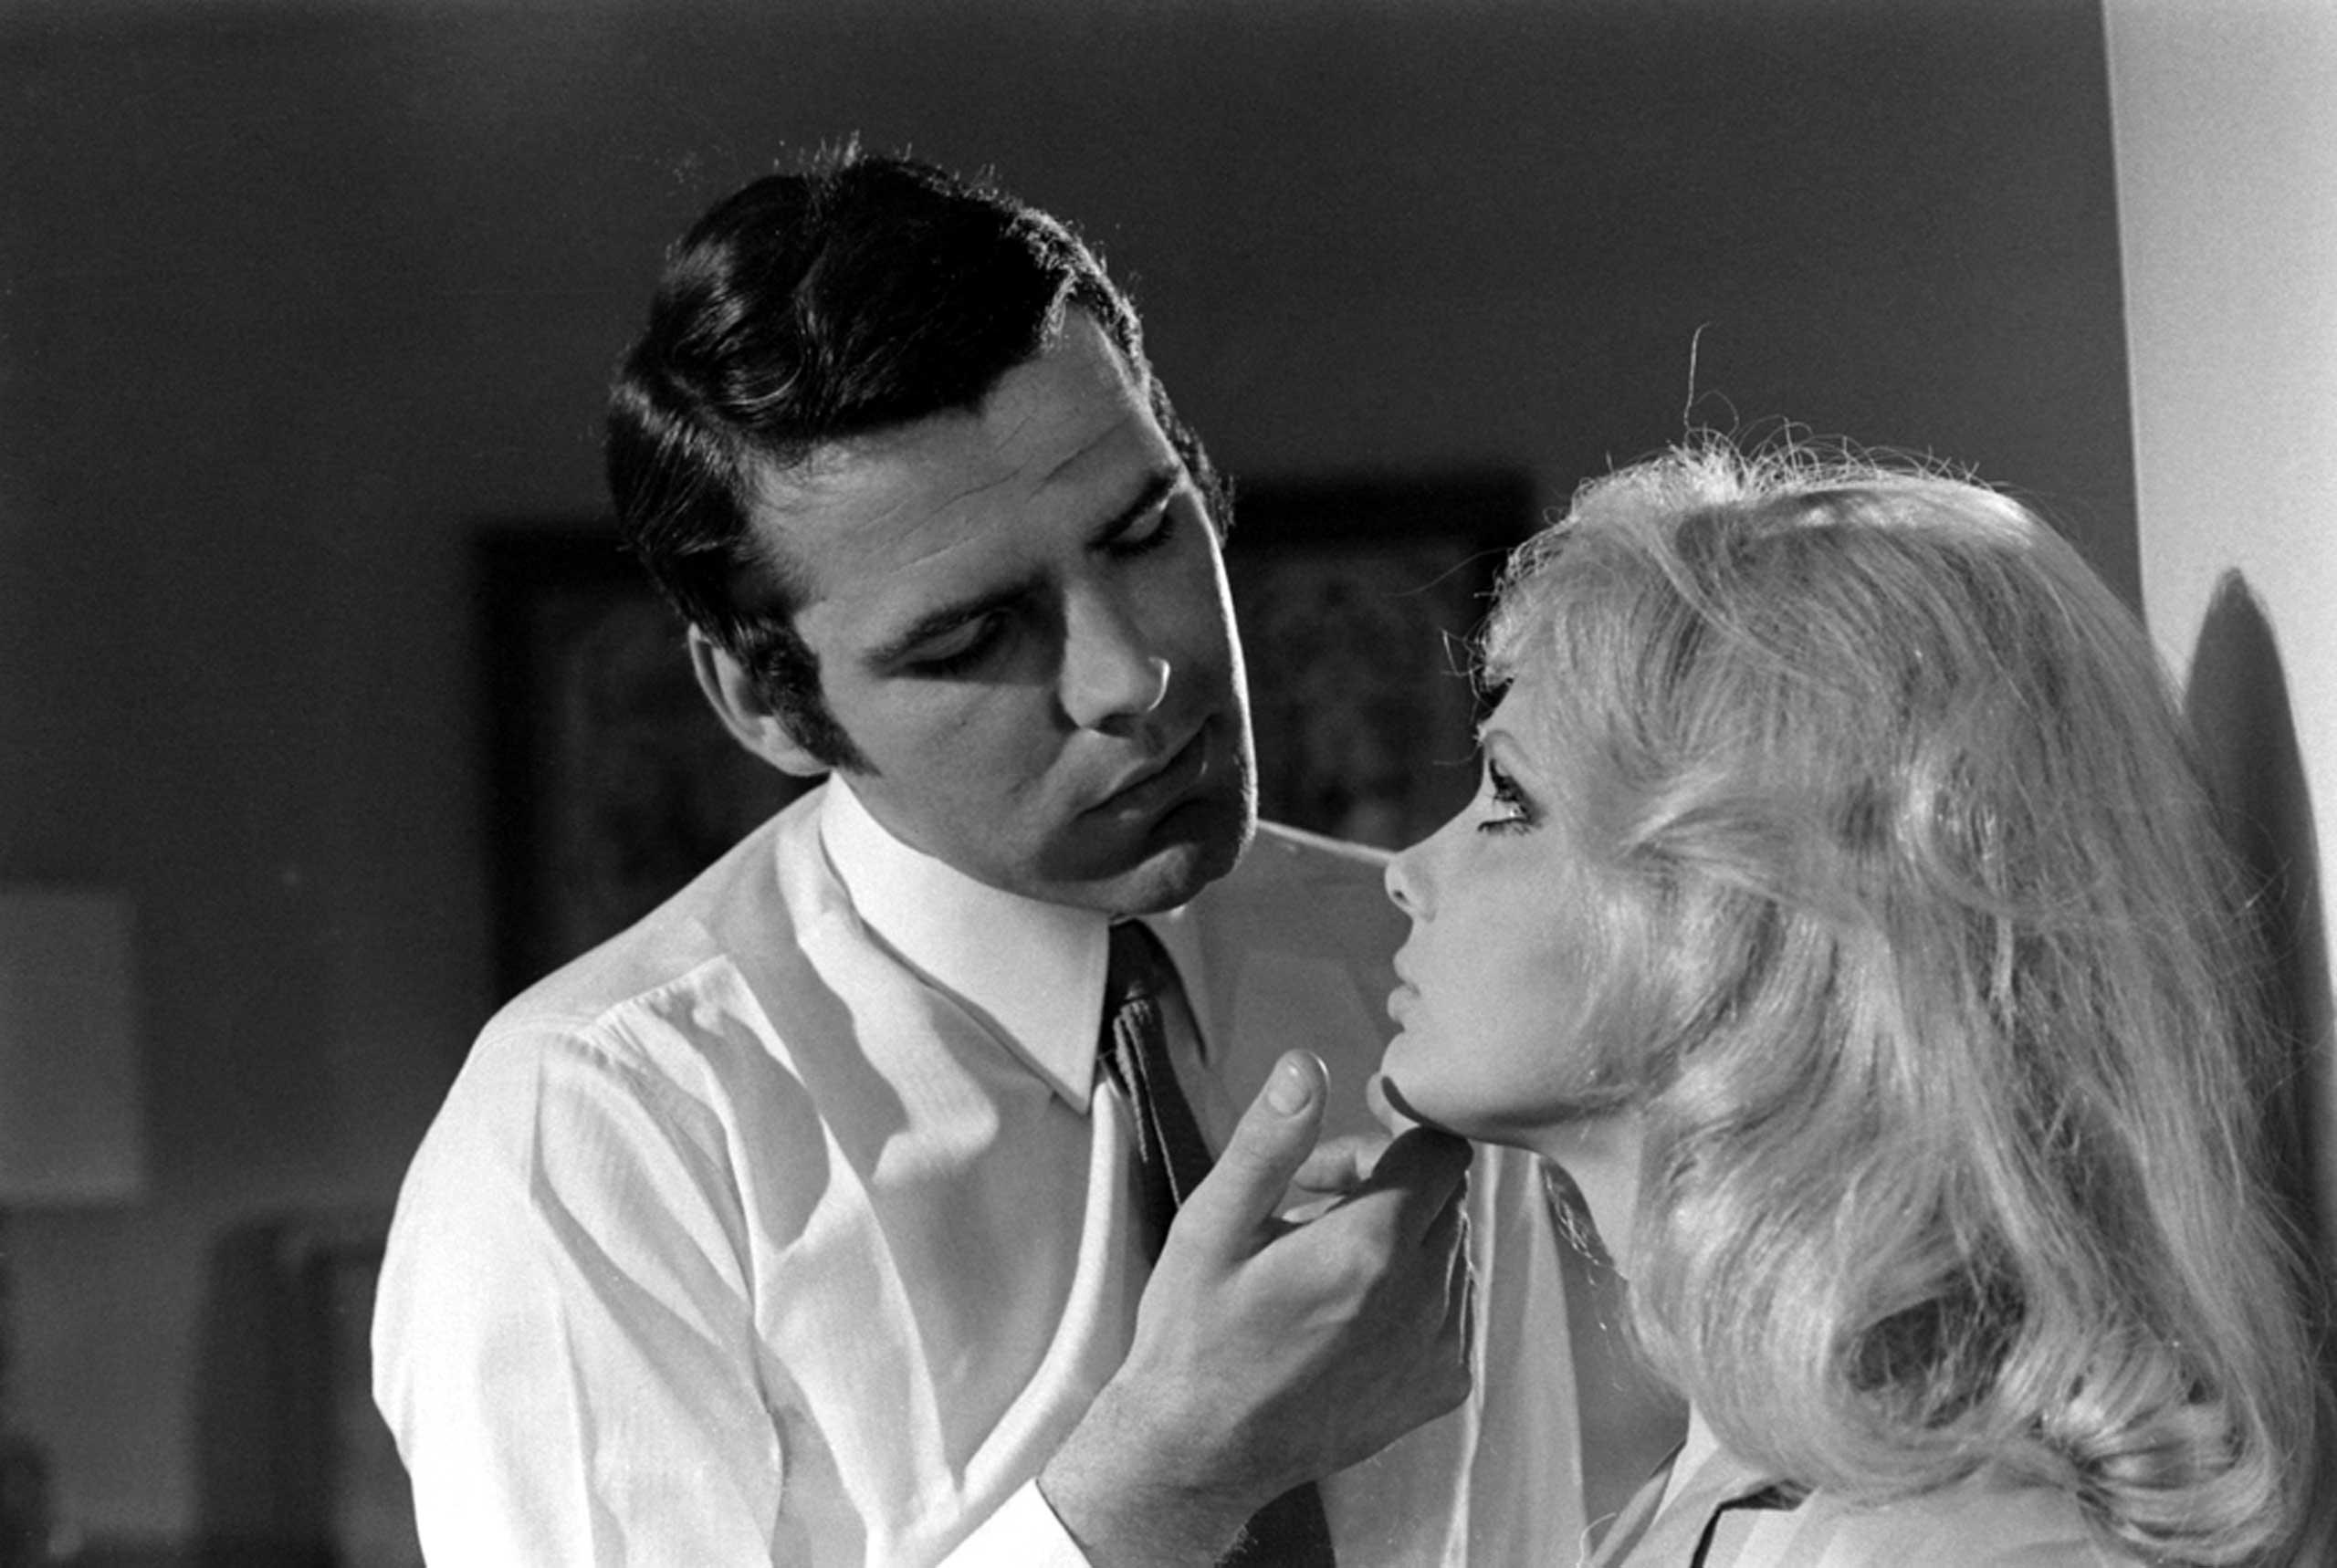 Hans De Vries and France Anglade, James Bond audition, 1967.